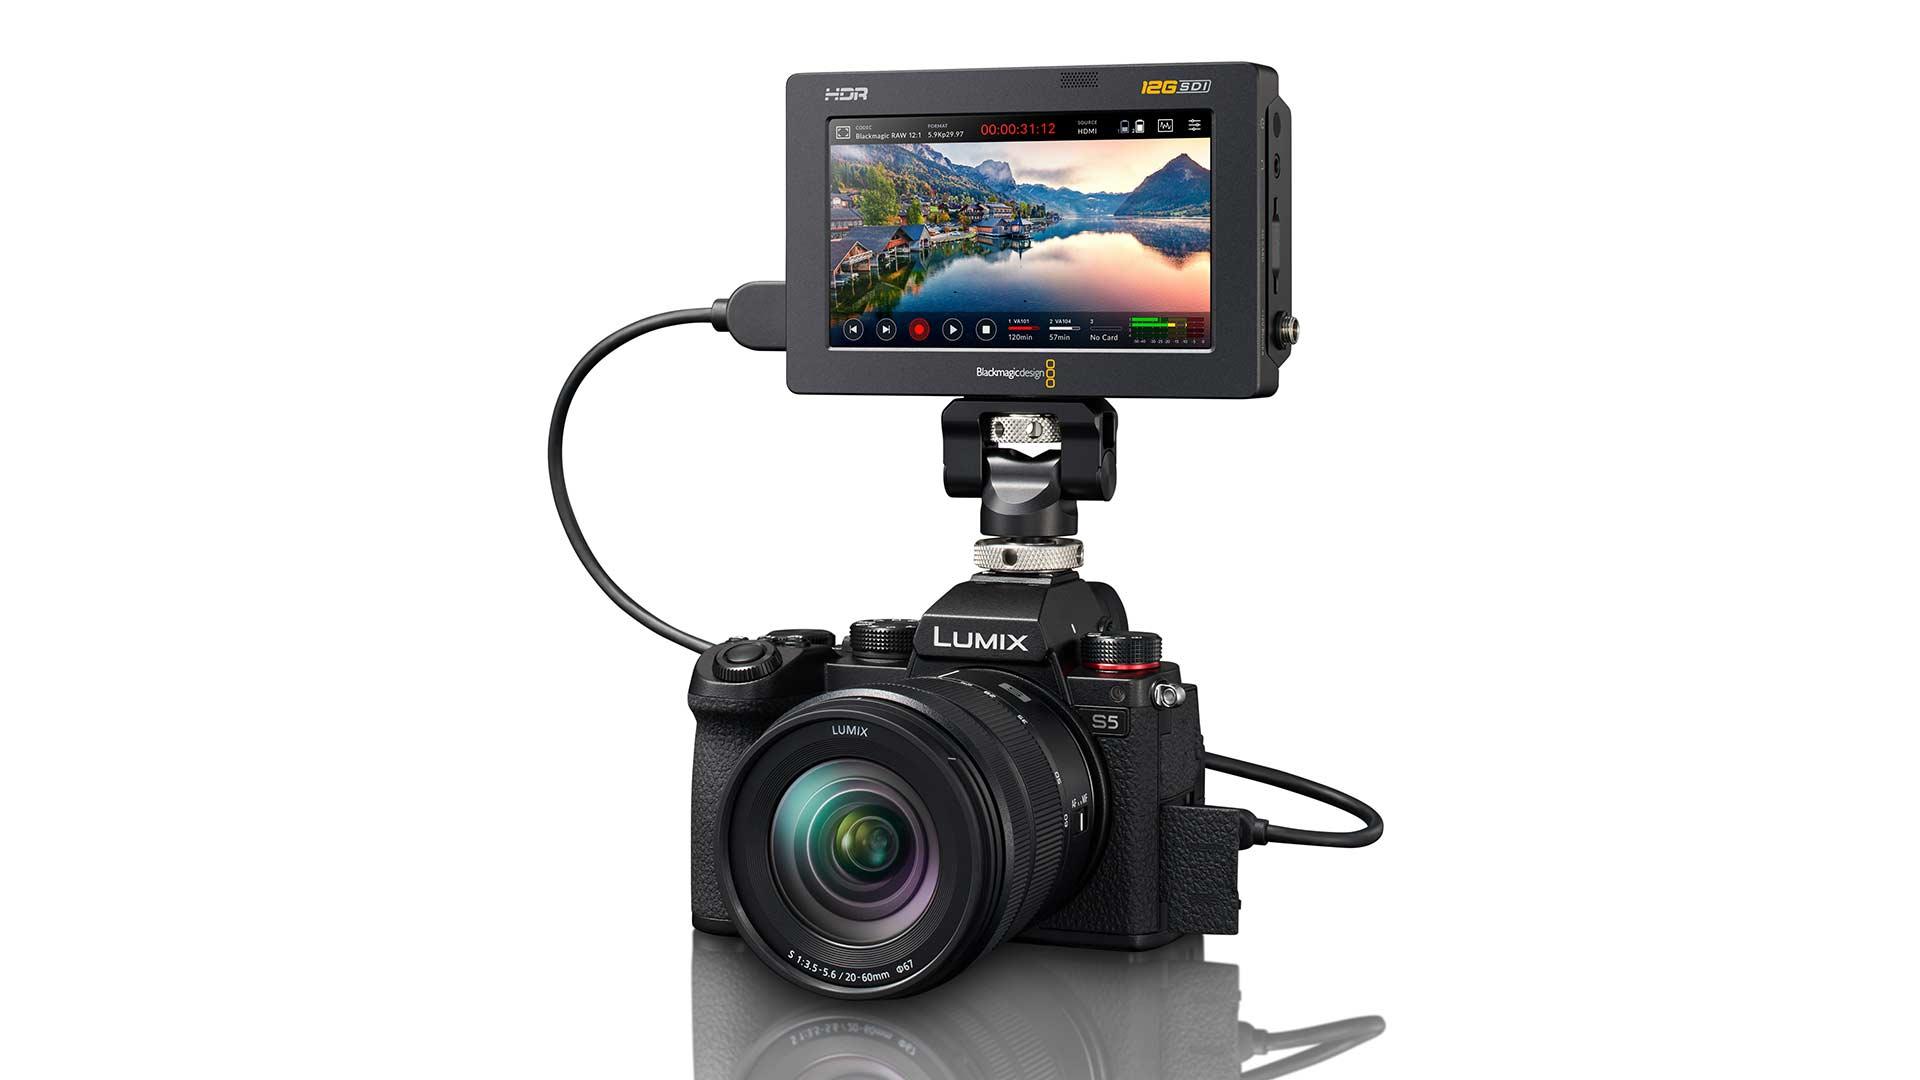 The Panasonic Lumix S5 with a Blackmagic Design Video Assist 12G HDR monitor/recorder. Image: Panasonic.